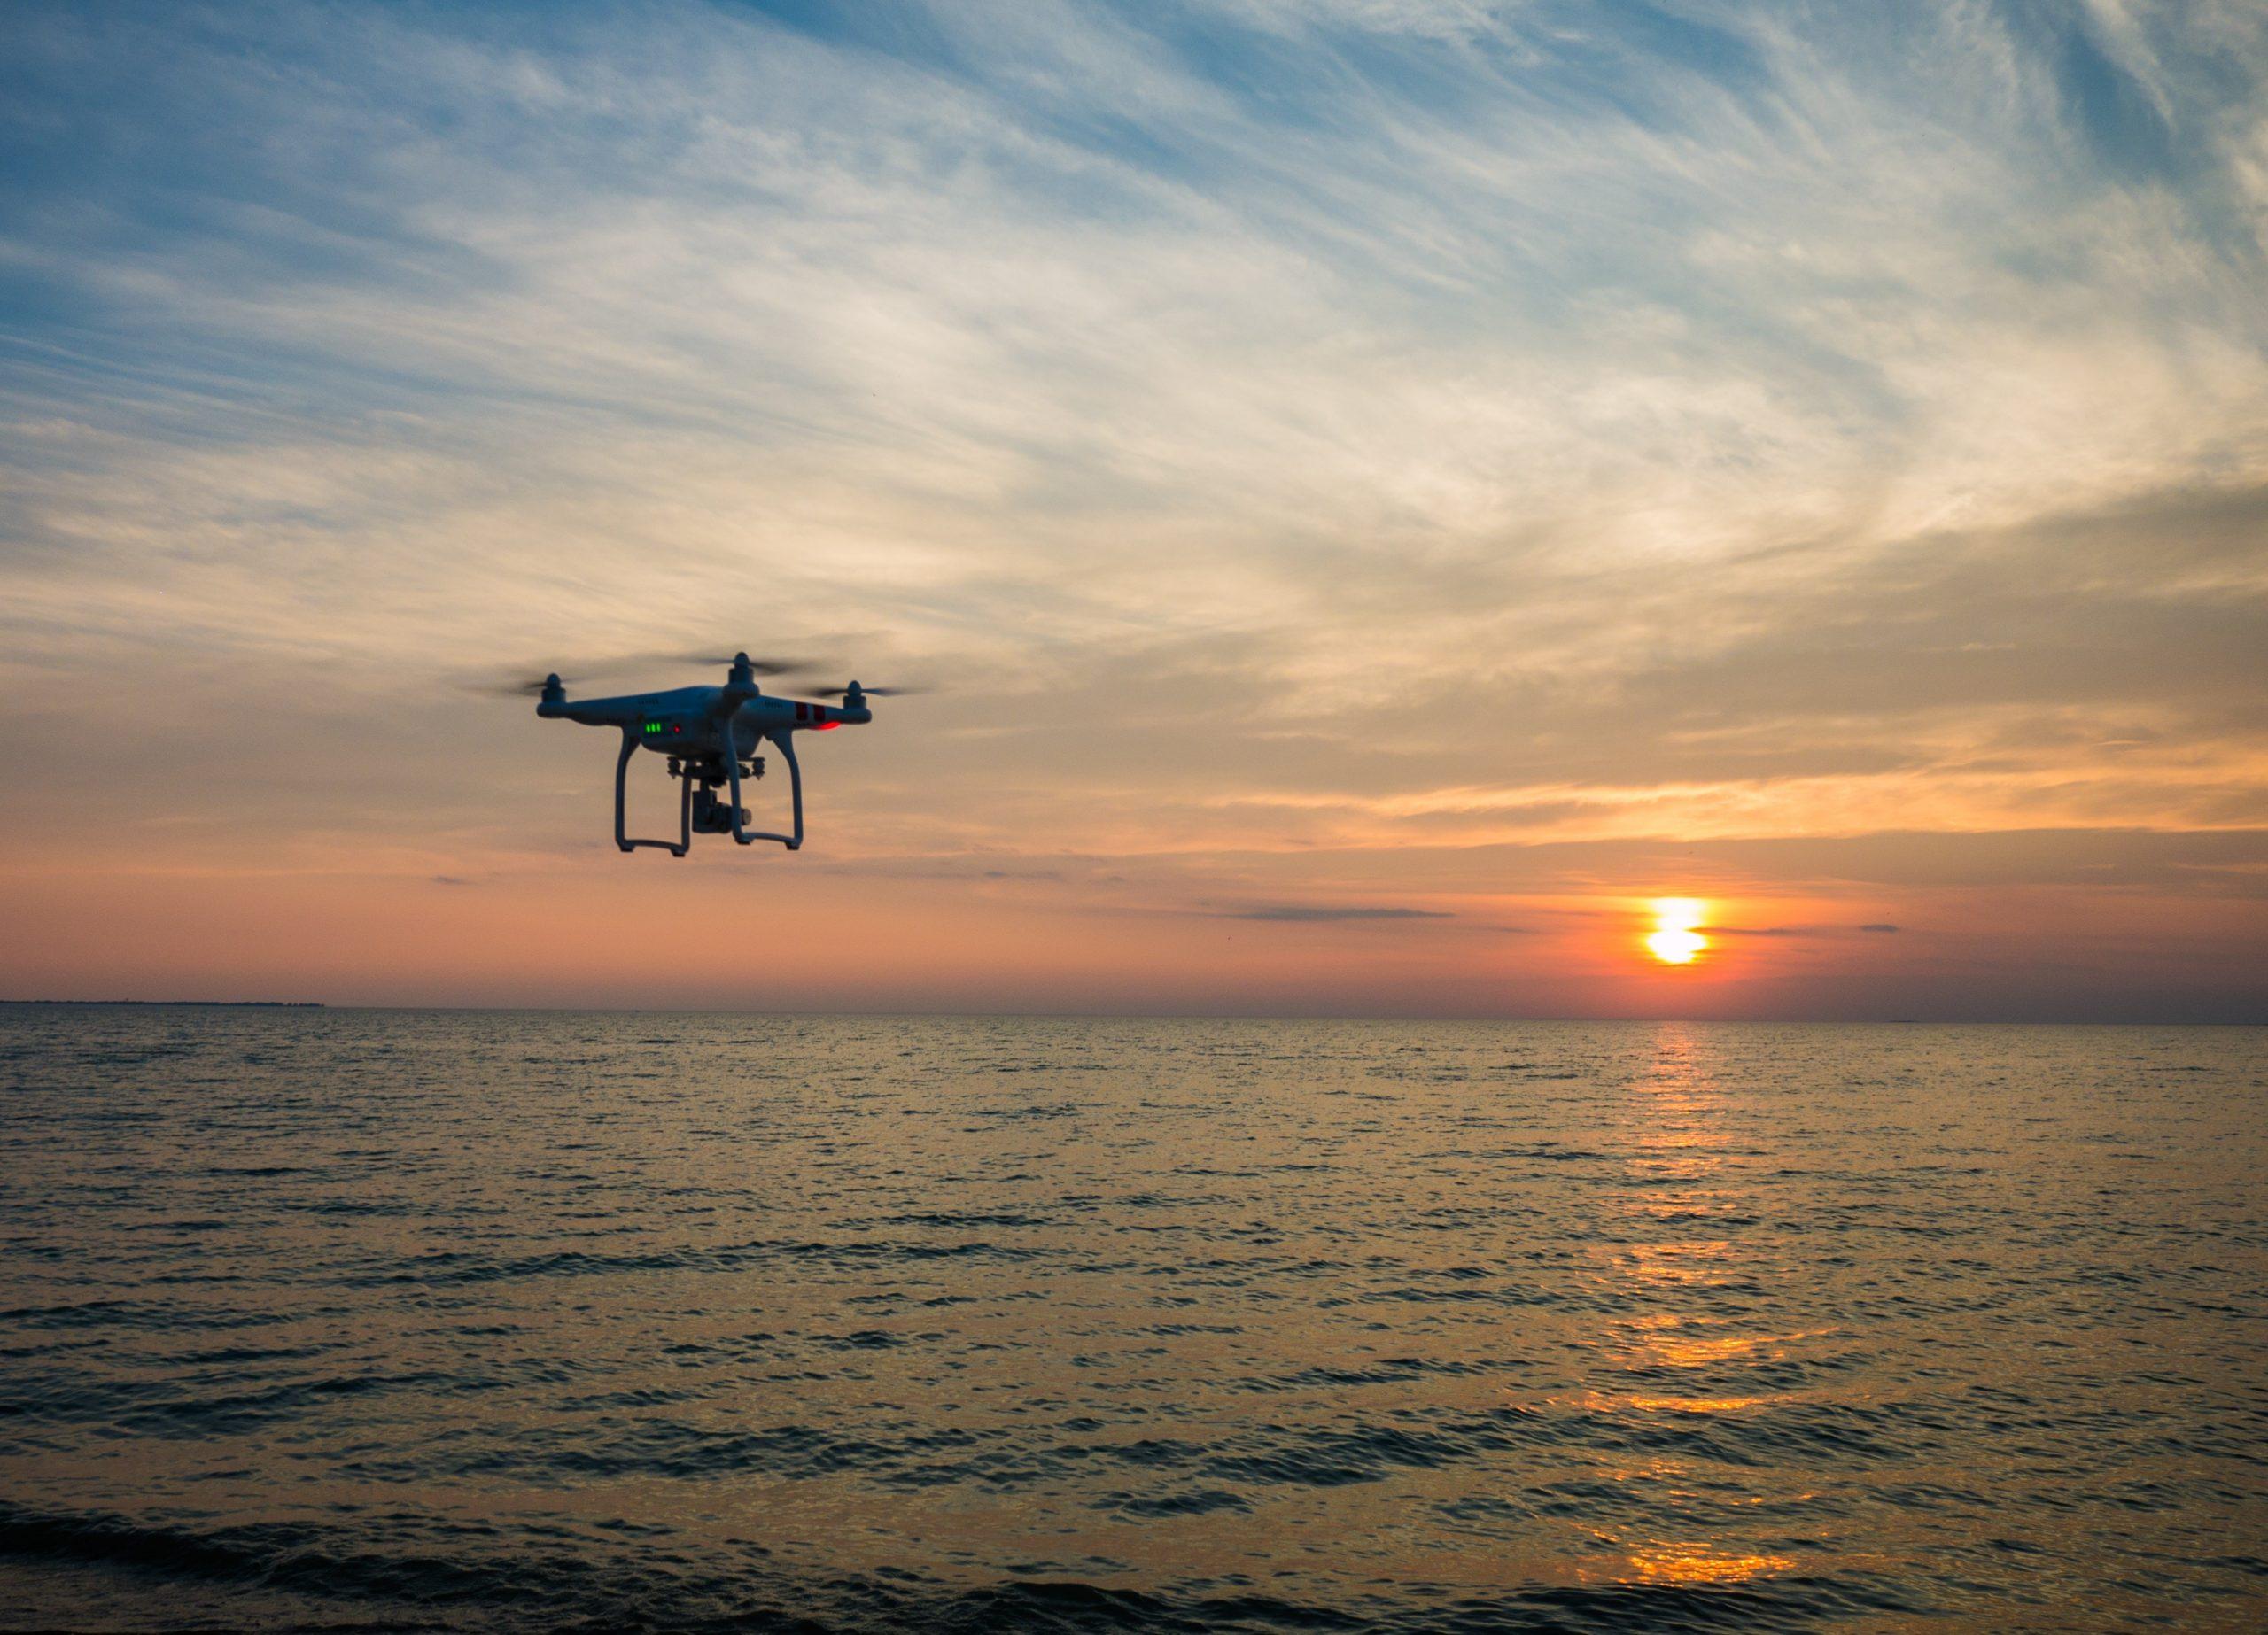 Australia Deploys More Shark-Scanning Drones to Prevent Attacks